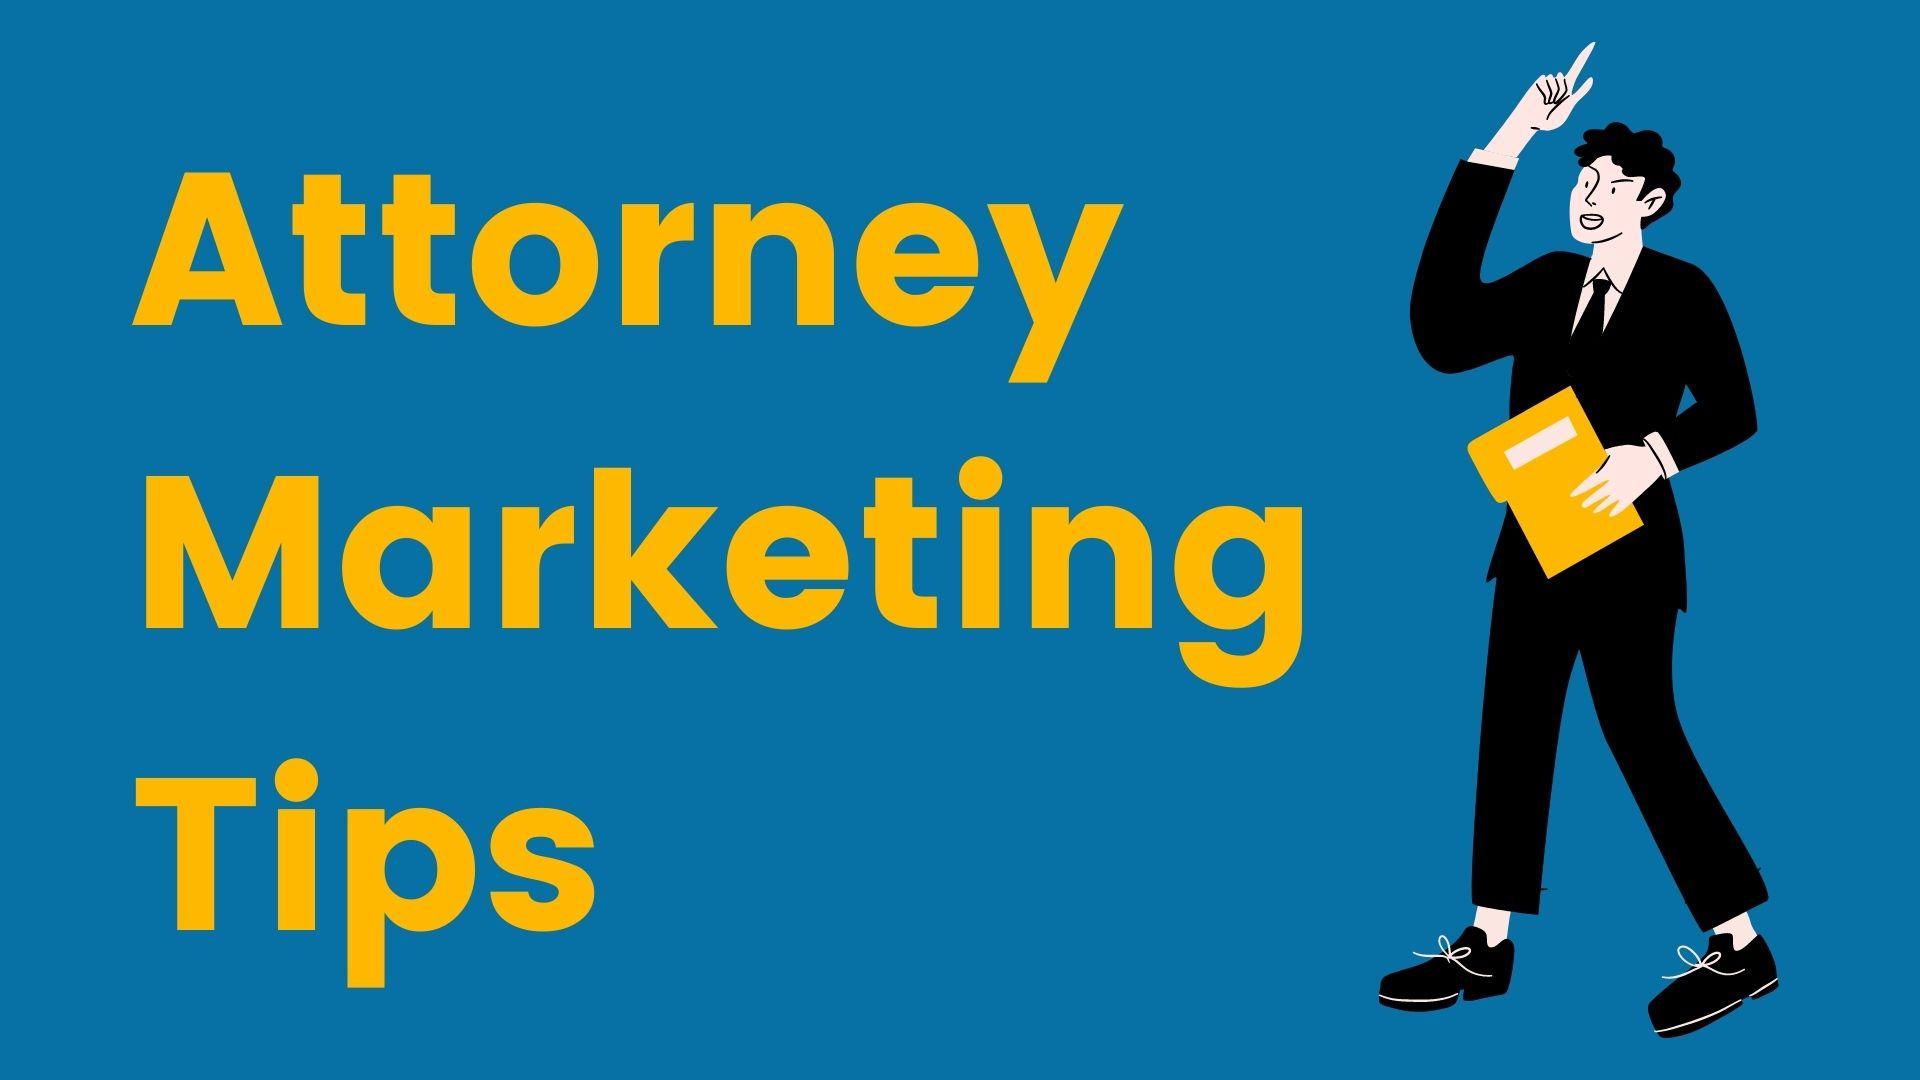 Attorney-marketing-tips